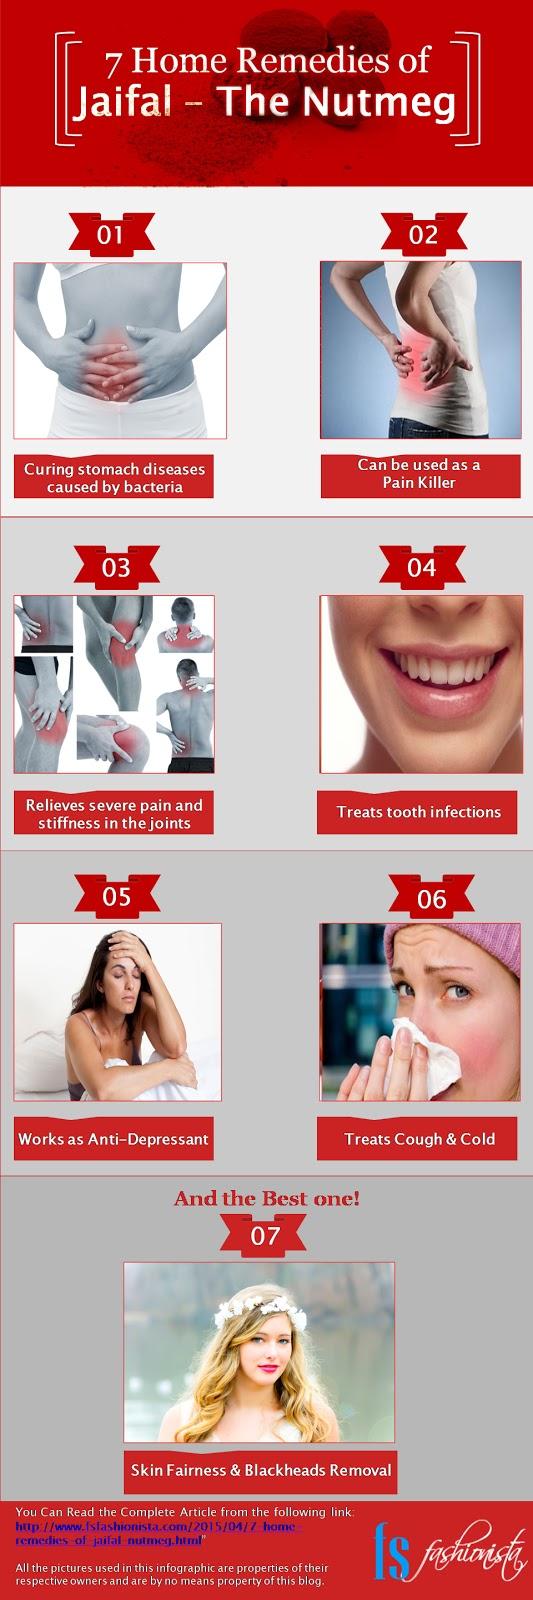 Jaifal Home Remedies Infographic